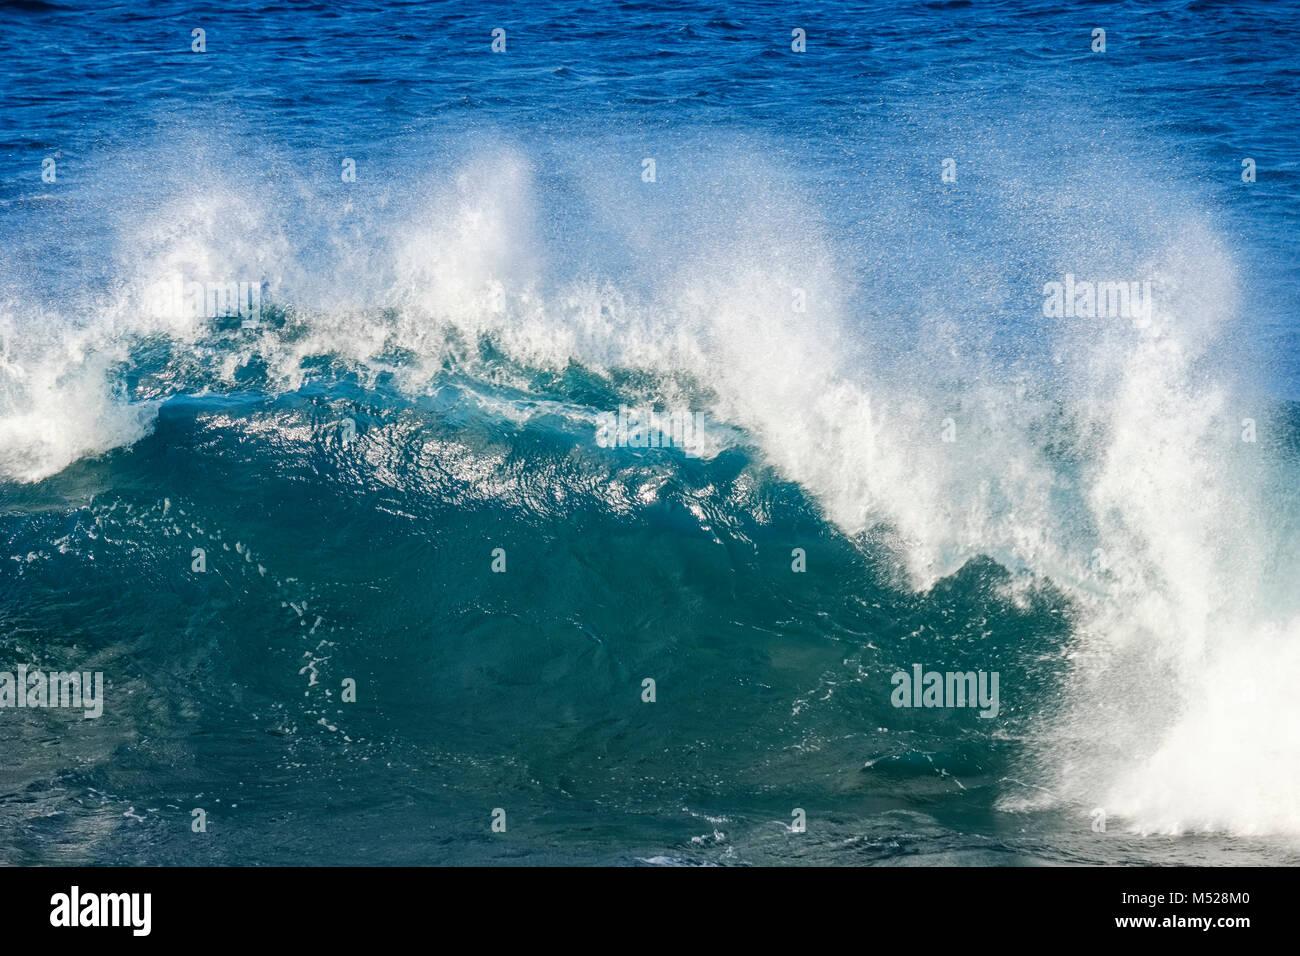 Breaking wave,Atlantic Ocean,La Gomera,Canary Islands,Canary Islands,Spain - Stock Image